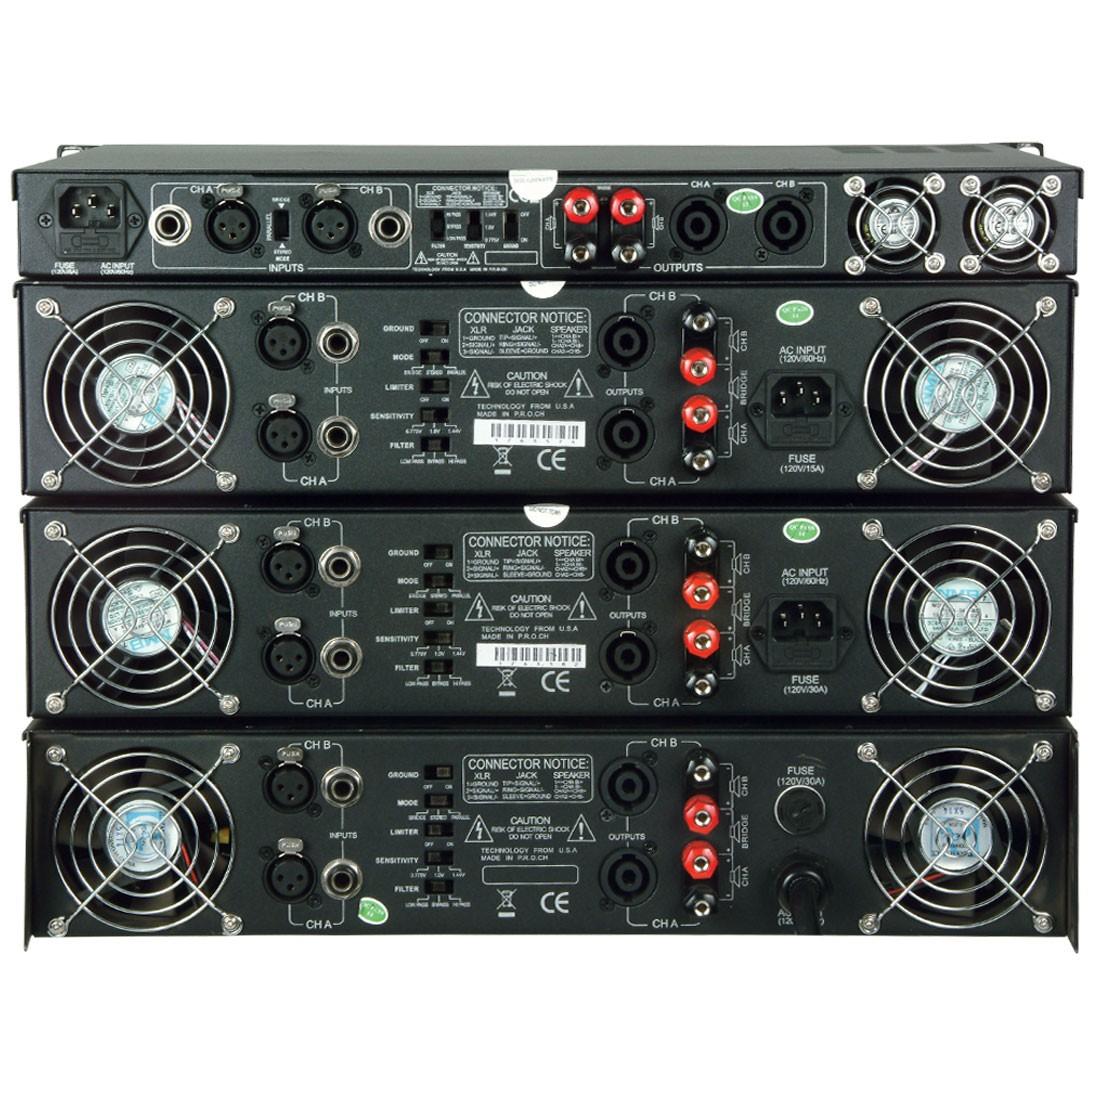 Vlp600 Power Amplifier Audio Products Adj Group 600w